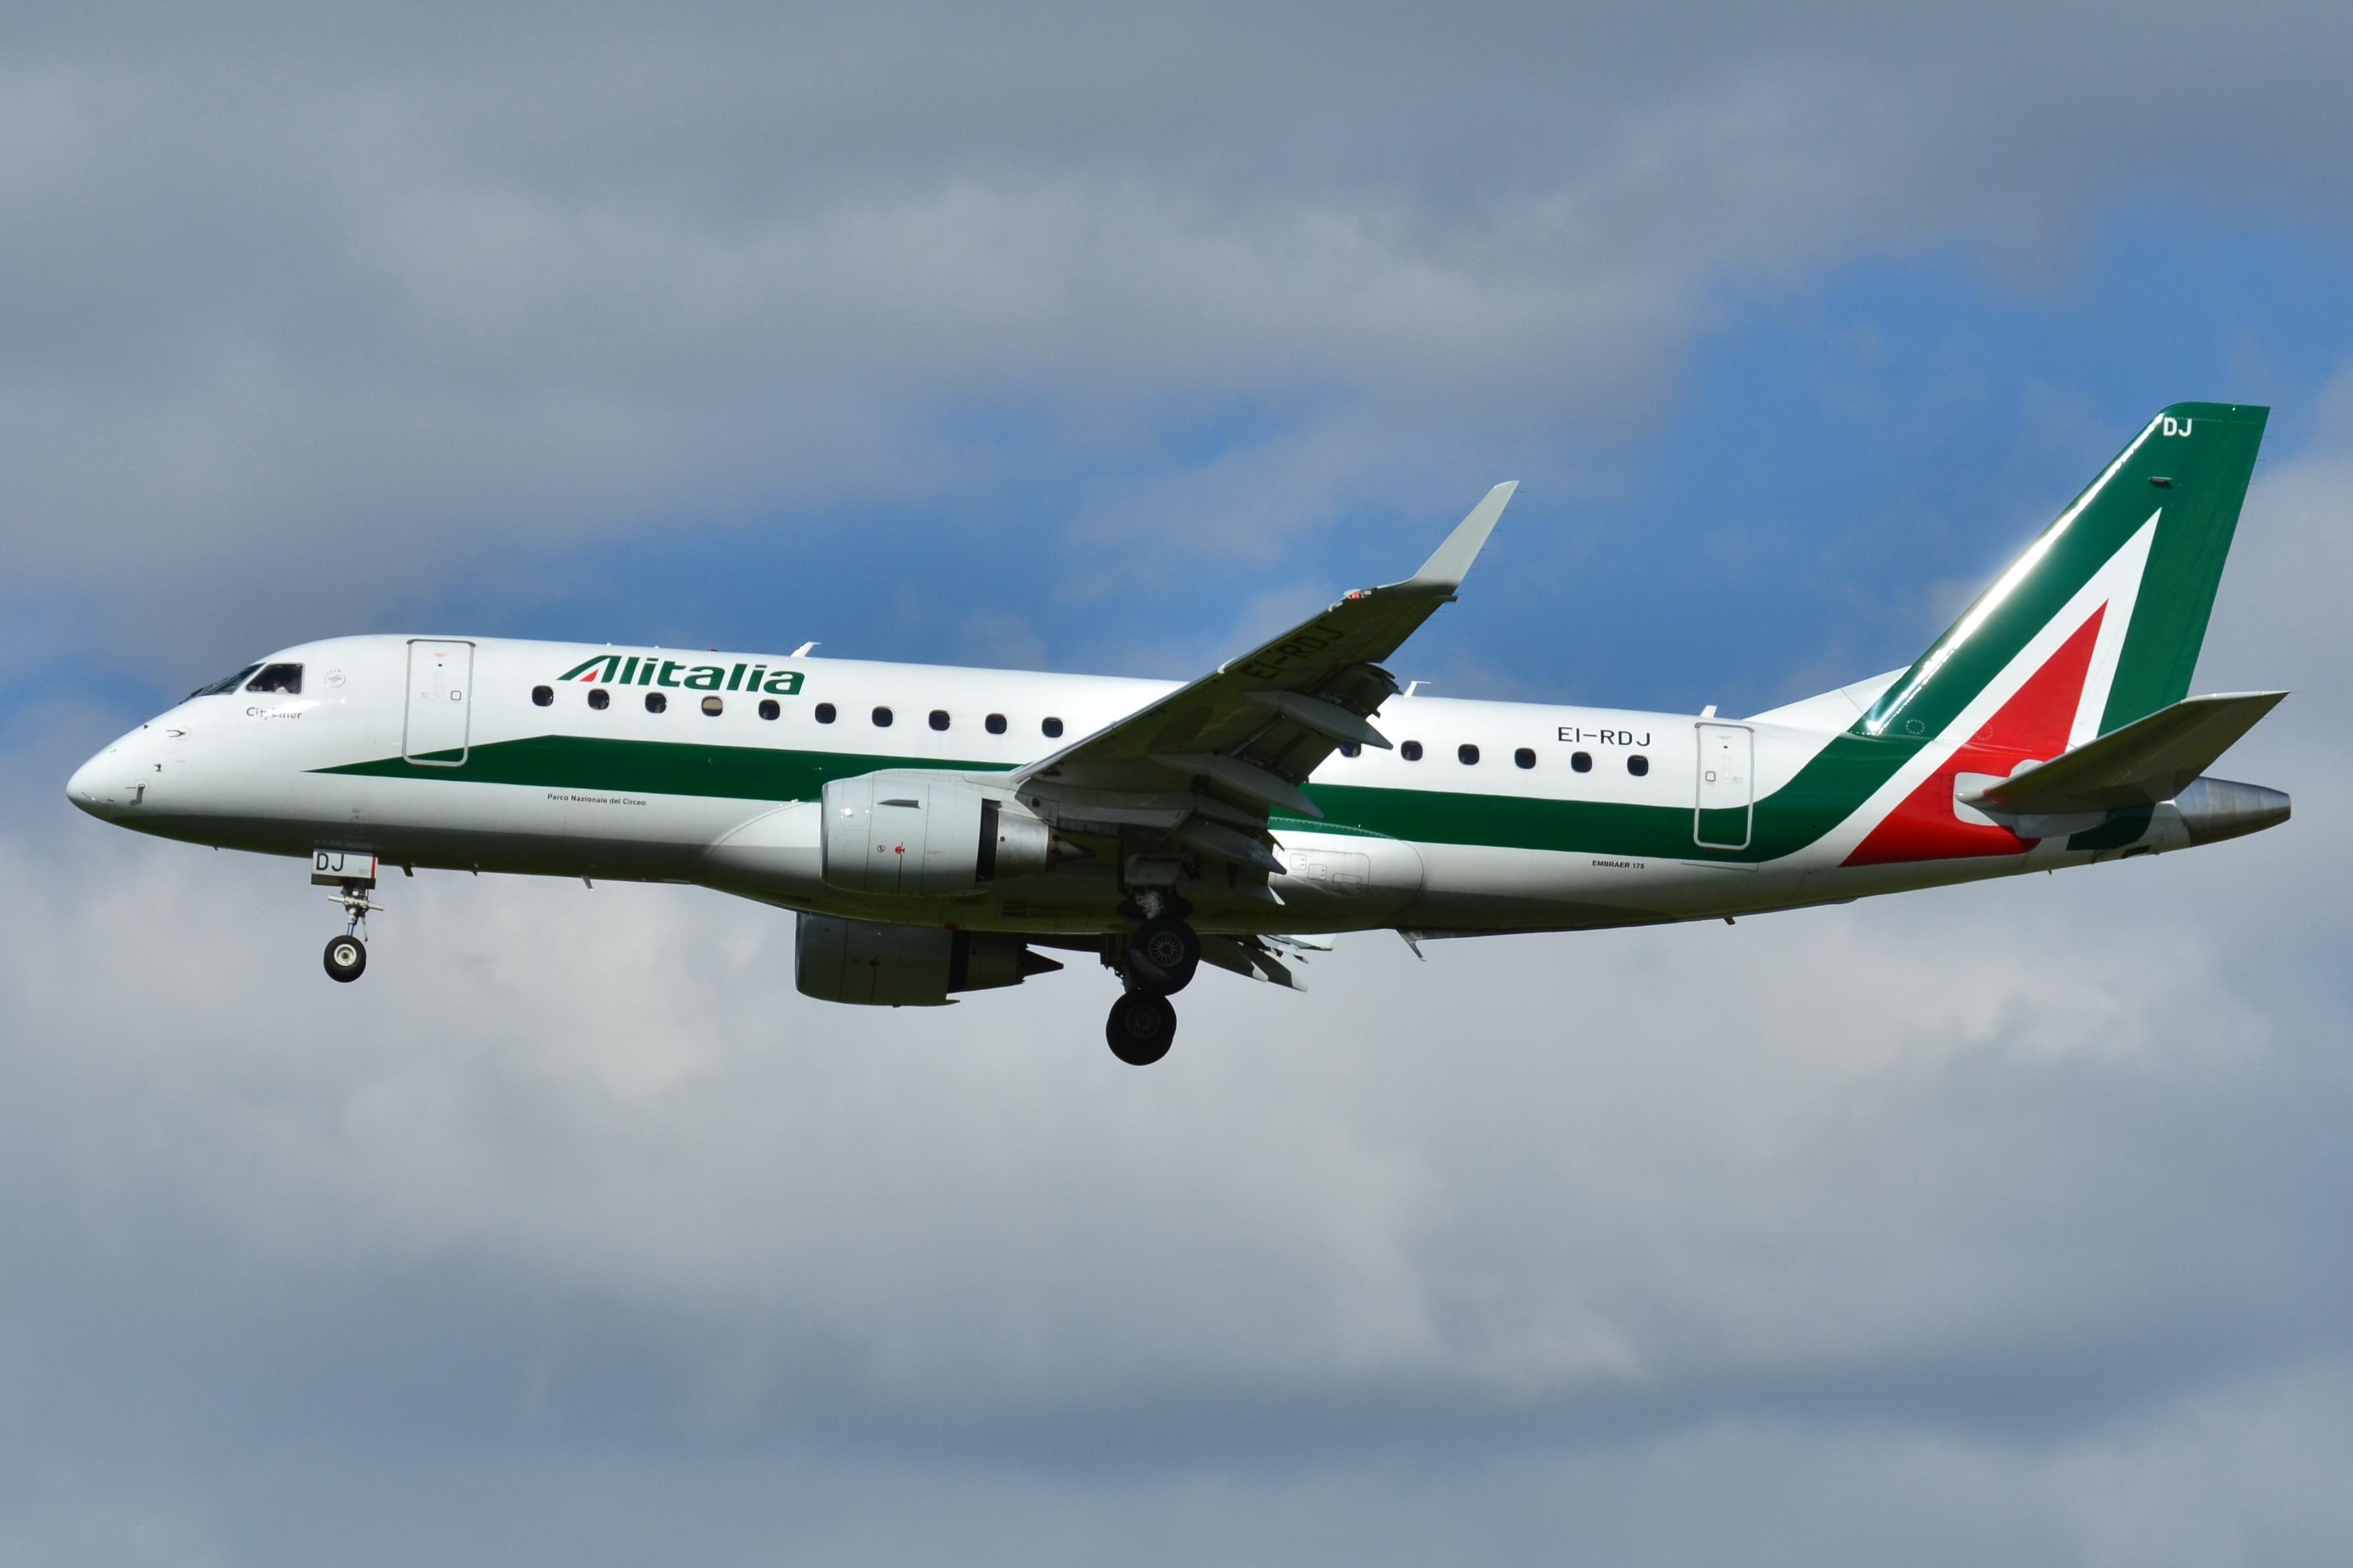 Alitalia Fleet Airfleets Aviation - fuel-economy info